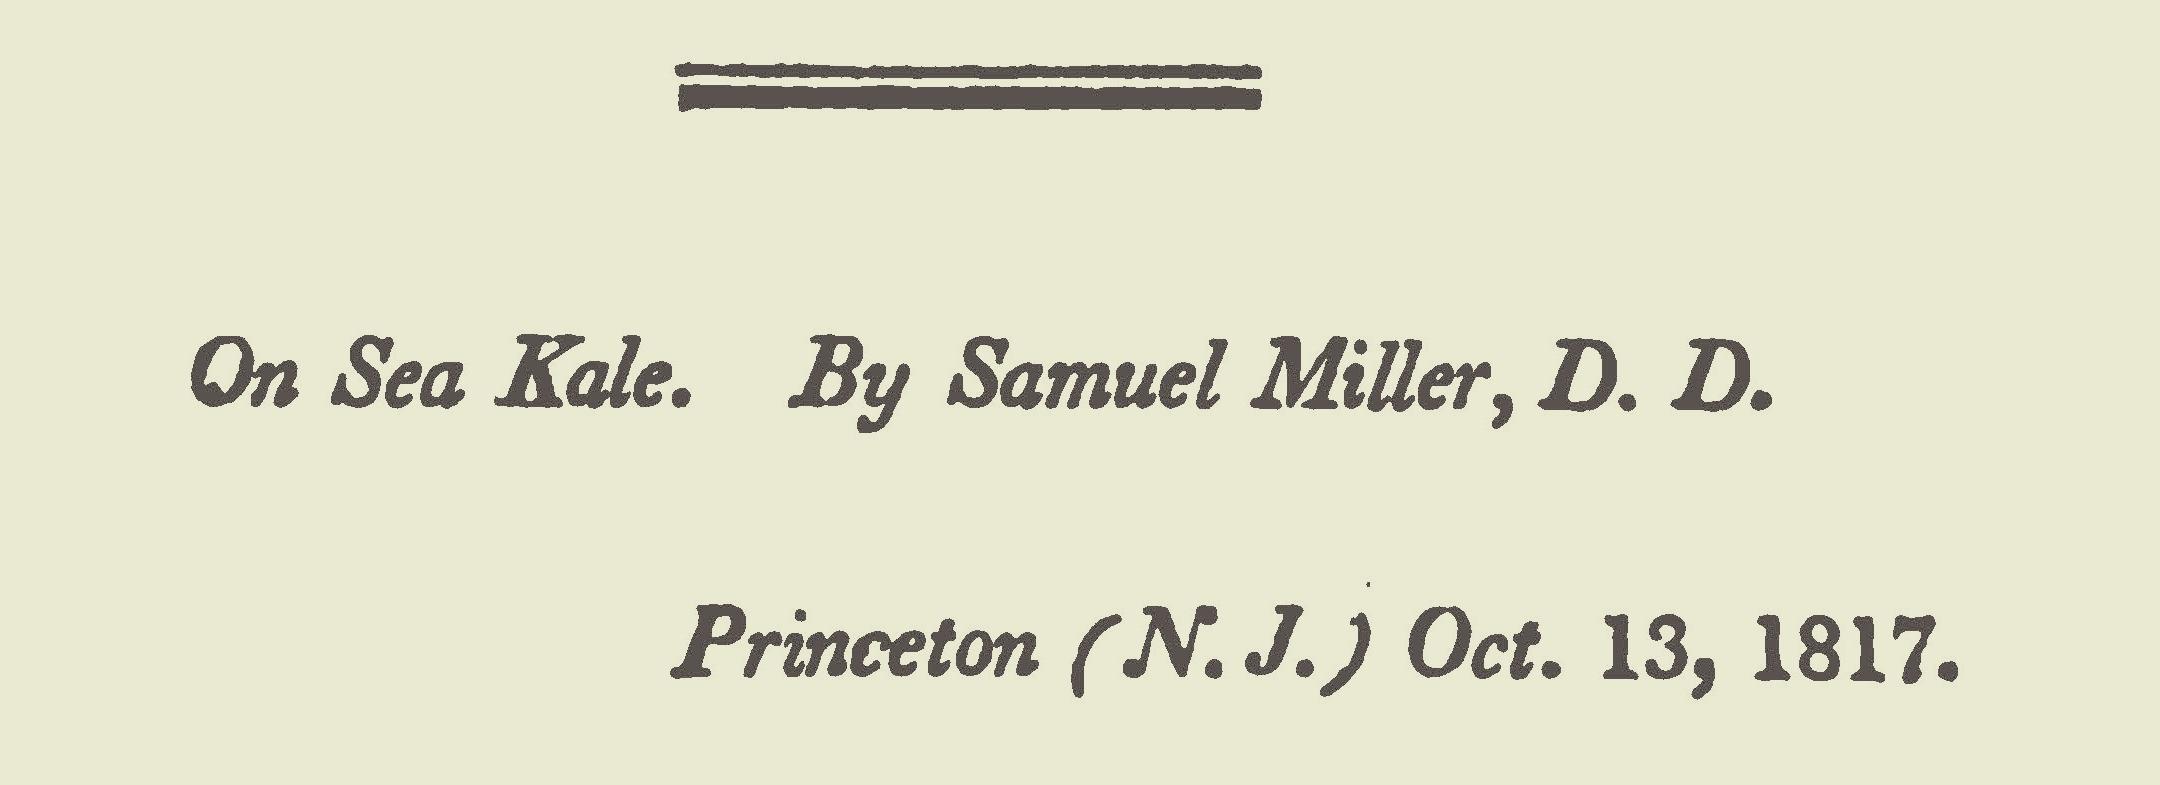 Miller, Samuel, A Letter on Sea Kale Title Page.jpg